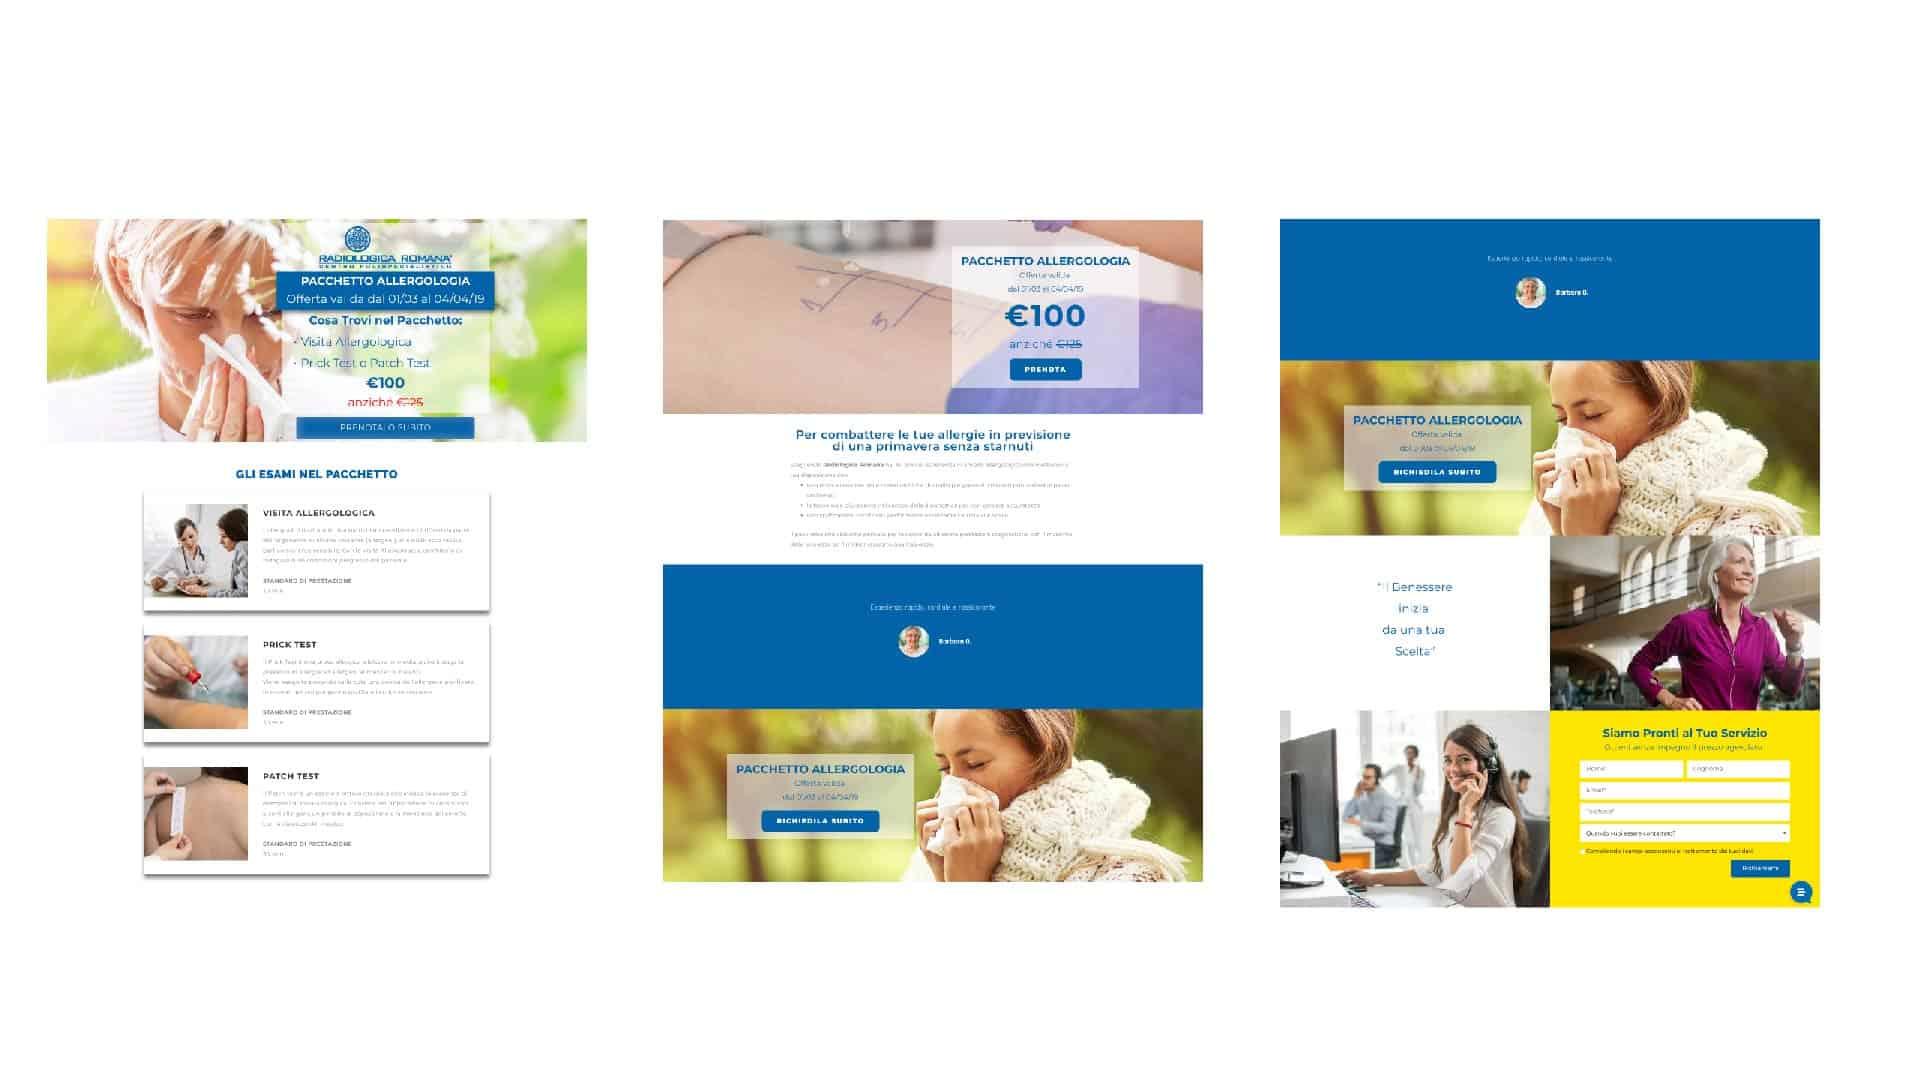 Diego Fabi - Portfolio - diego fabi portfolio webdesign radiologica -